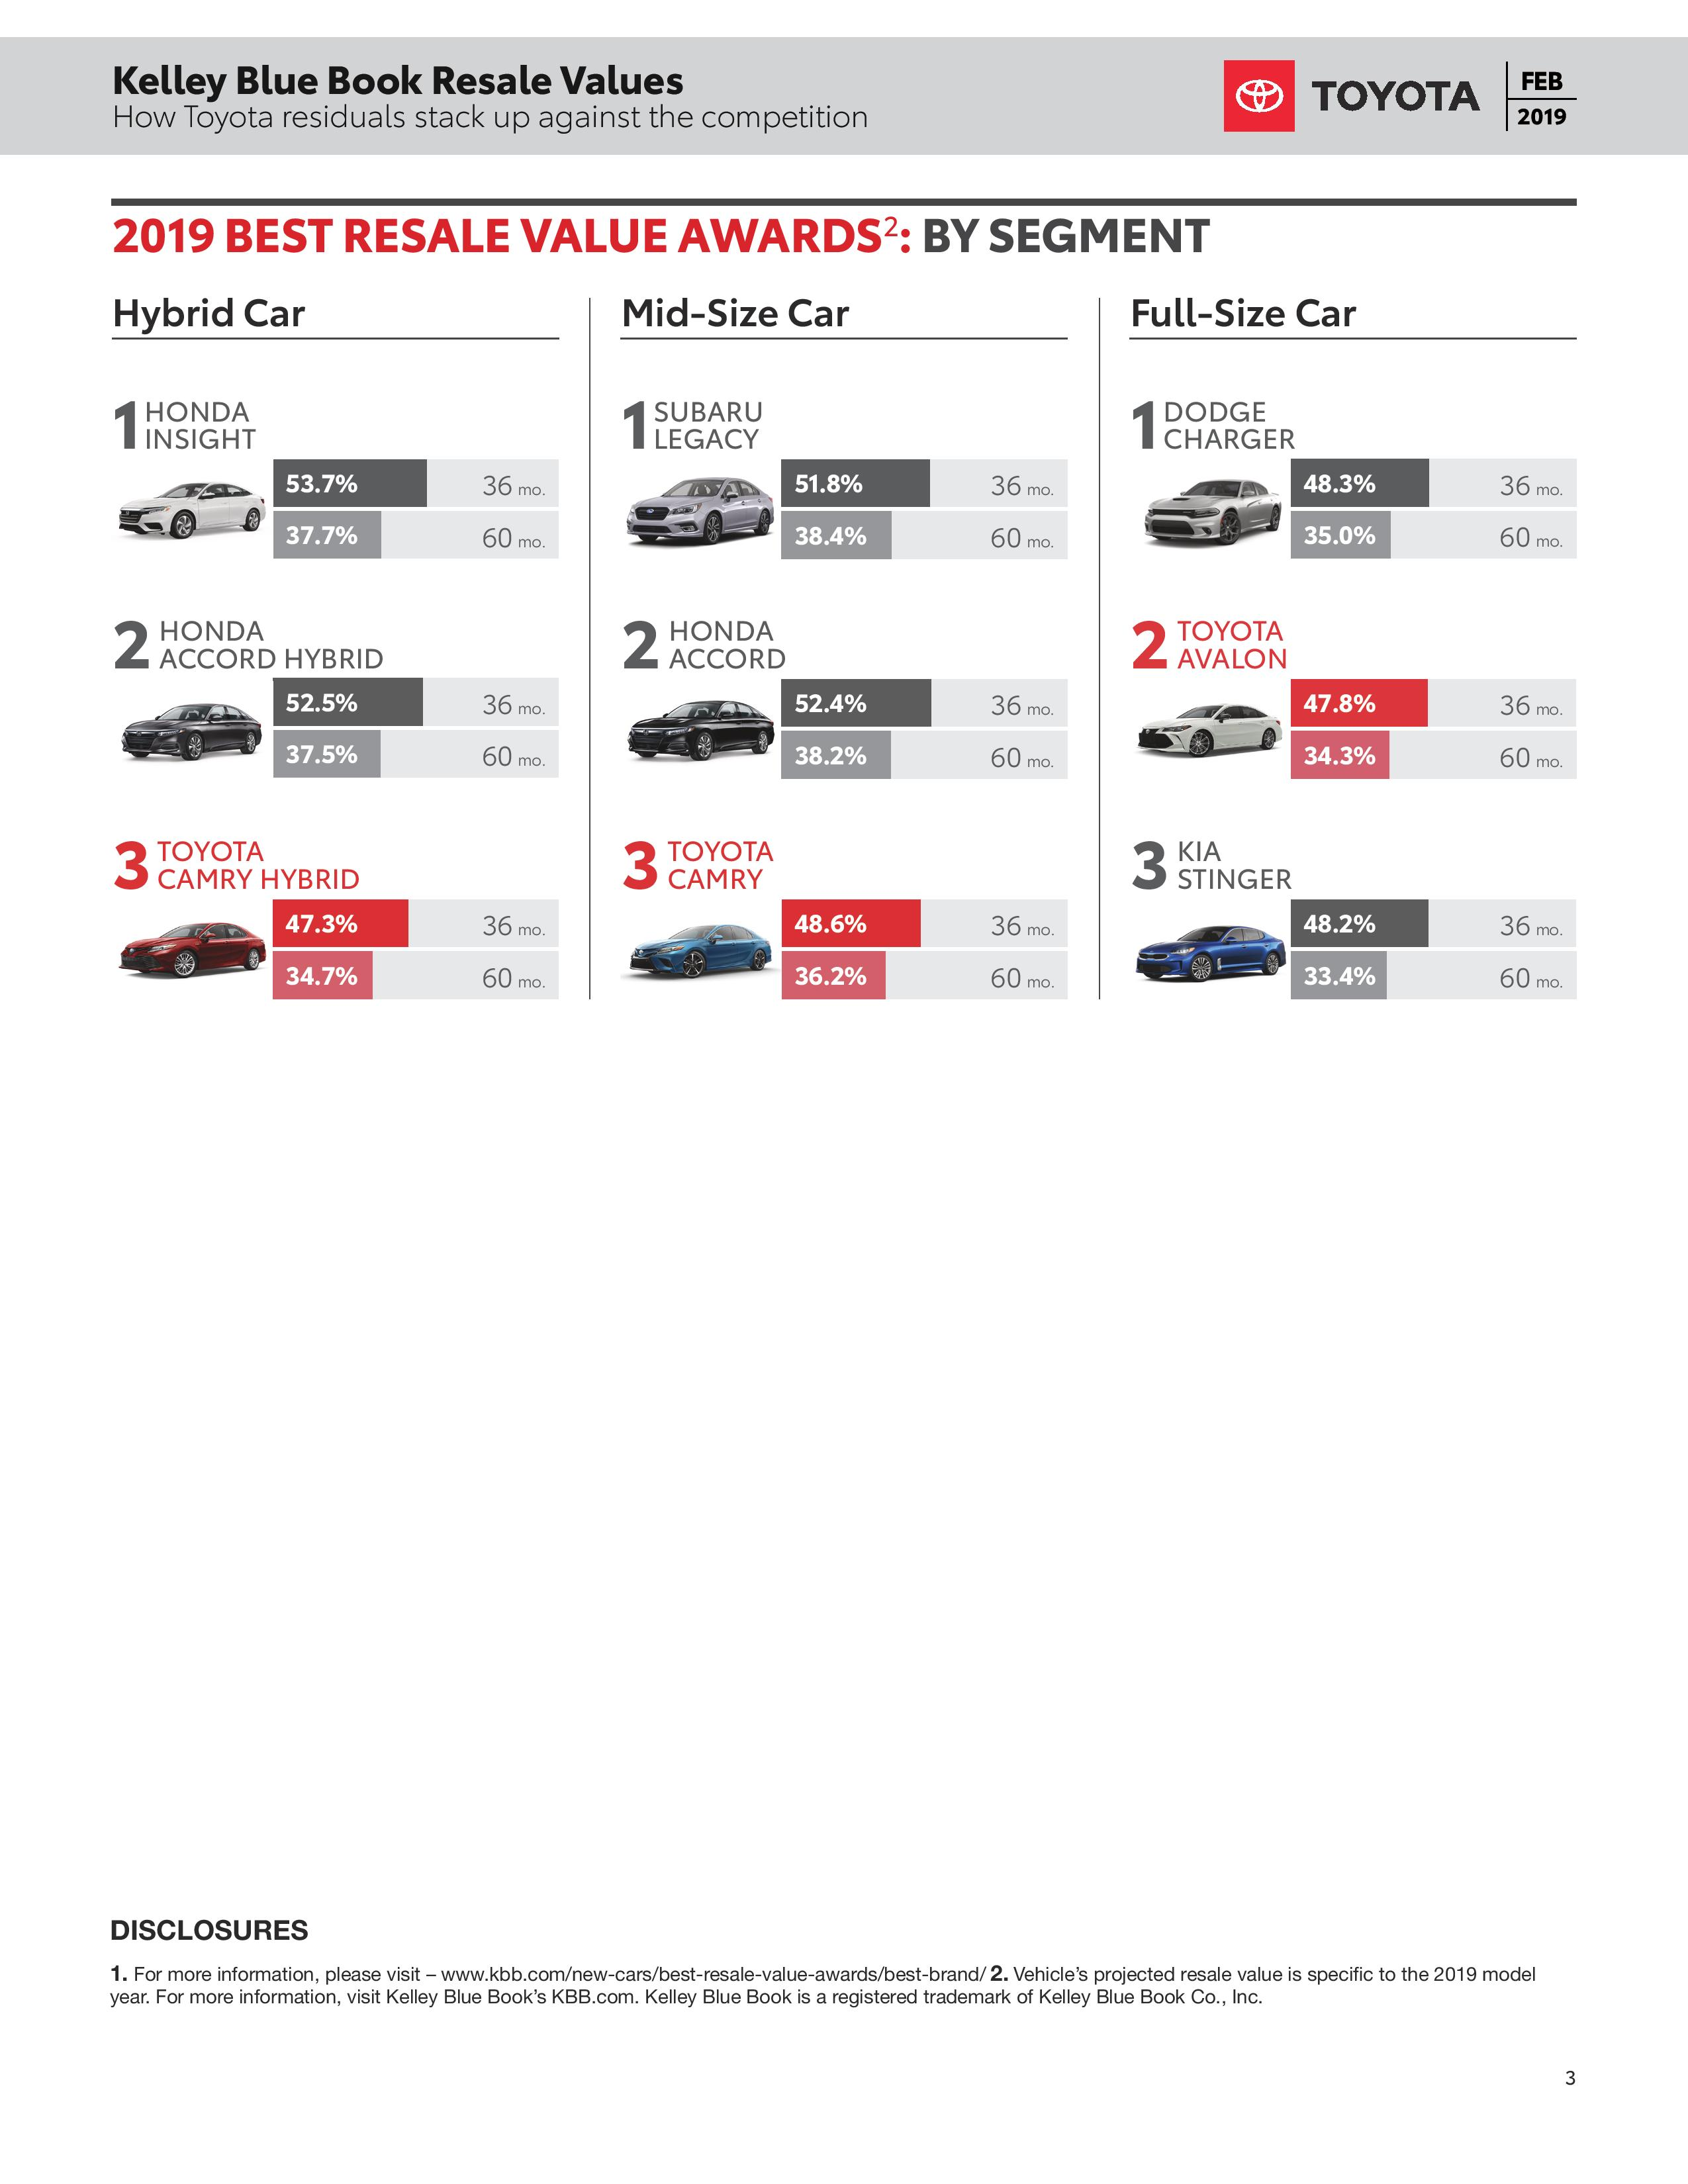 Kelley Blue Book Resale Values - Heart City Toyota